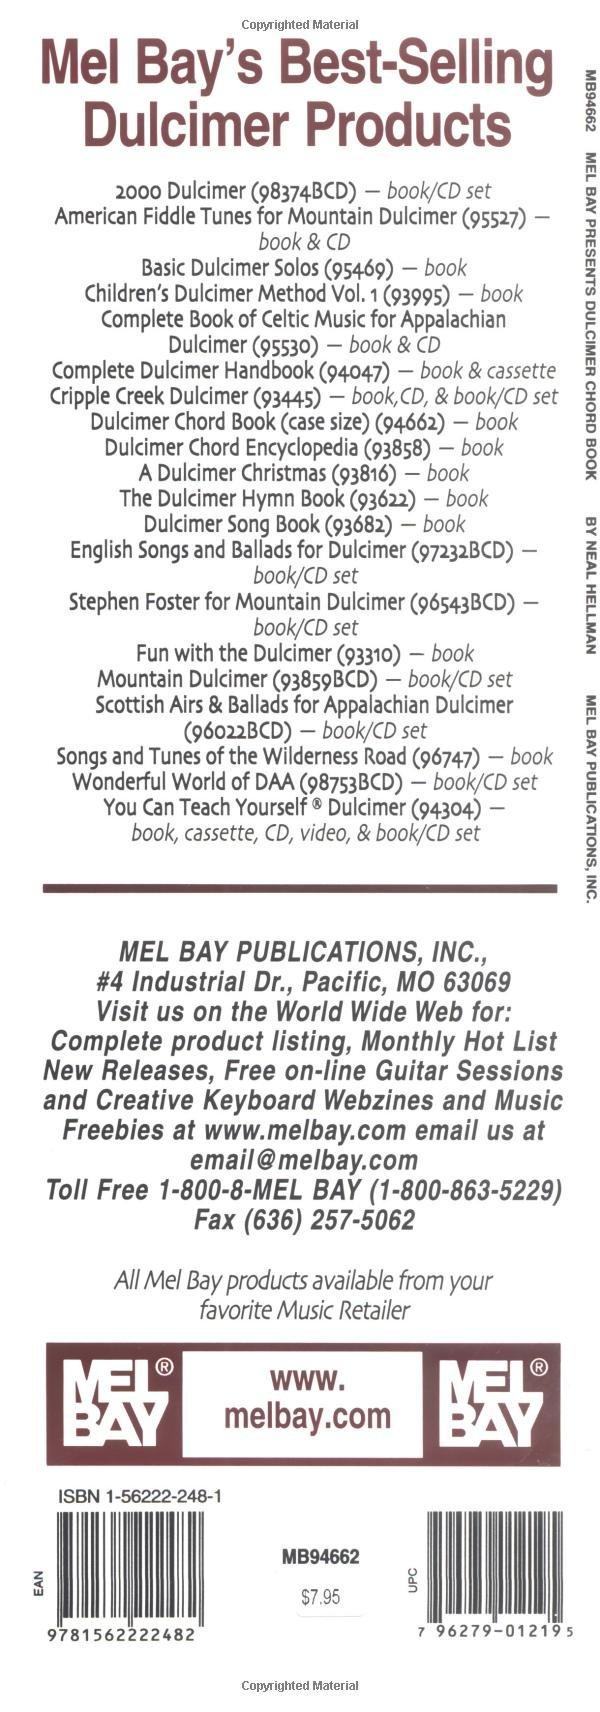 Mel Bay Dulcimer Chord Book Neal Hellman 9781562222482 Amazon